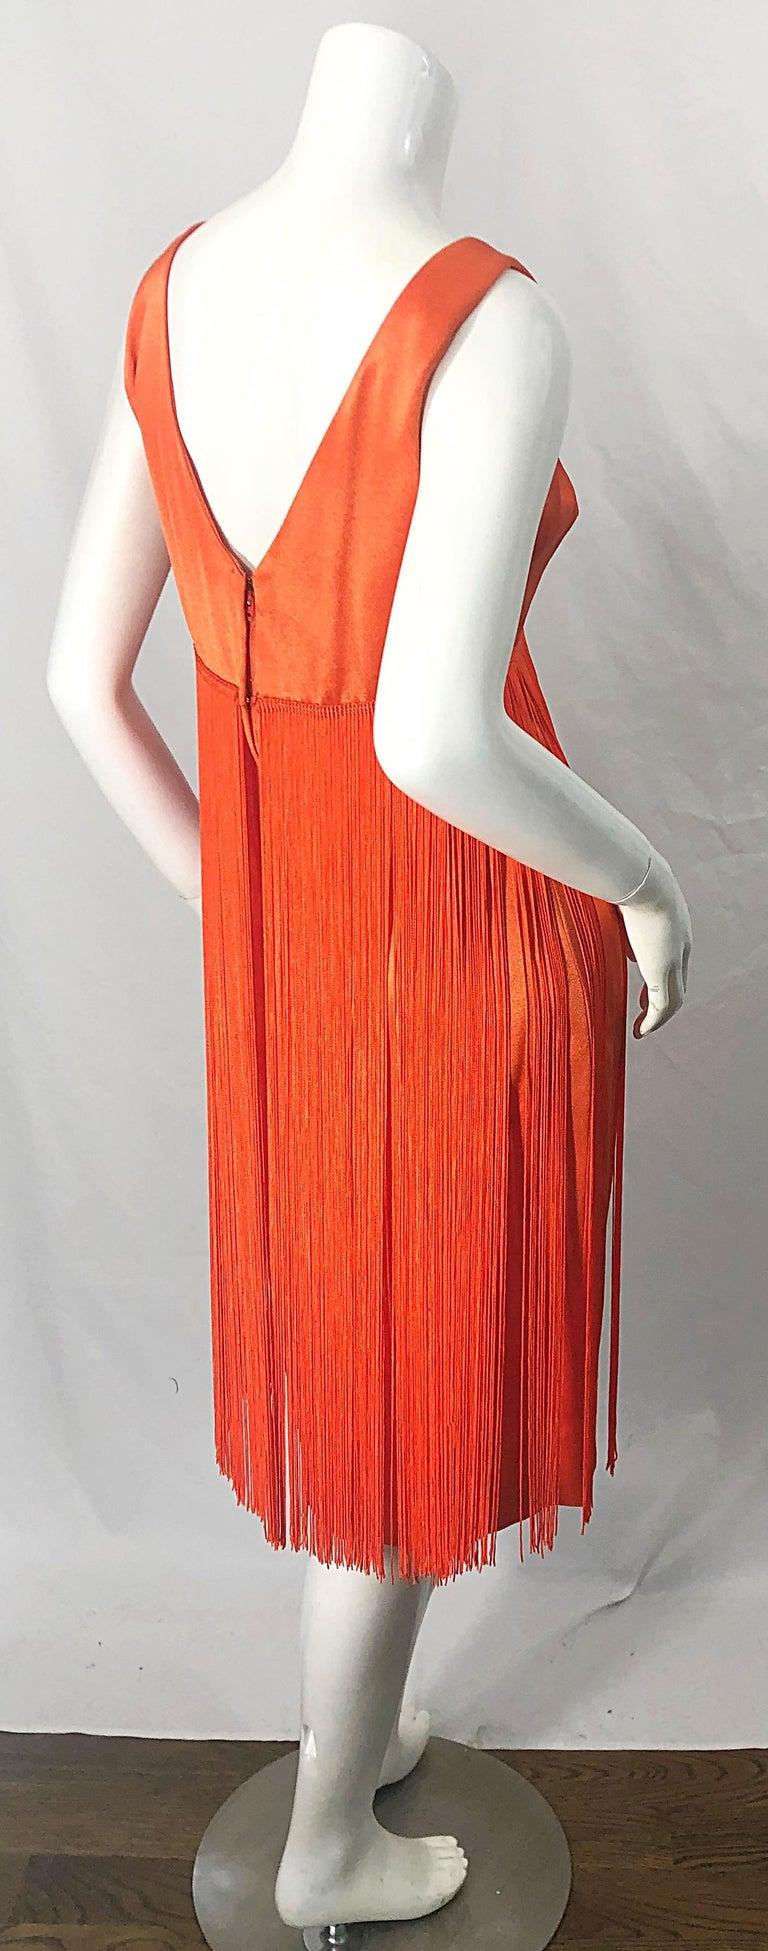 1960s Joseph Magnin Neon Orange Fully Fringed Vintage 60s Flapper Dress For Sale 7